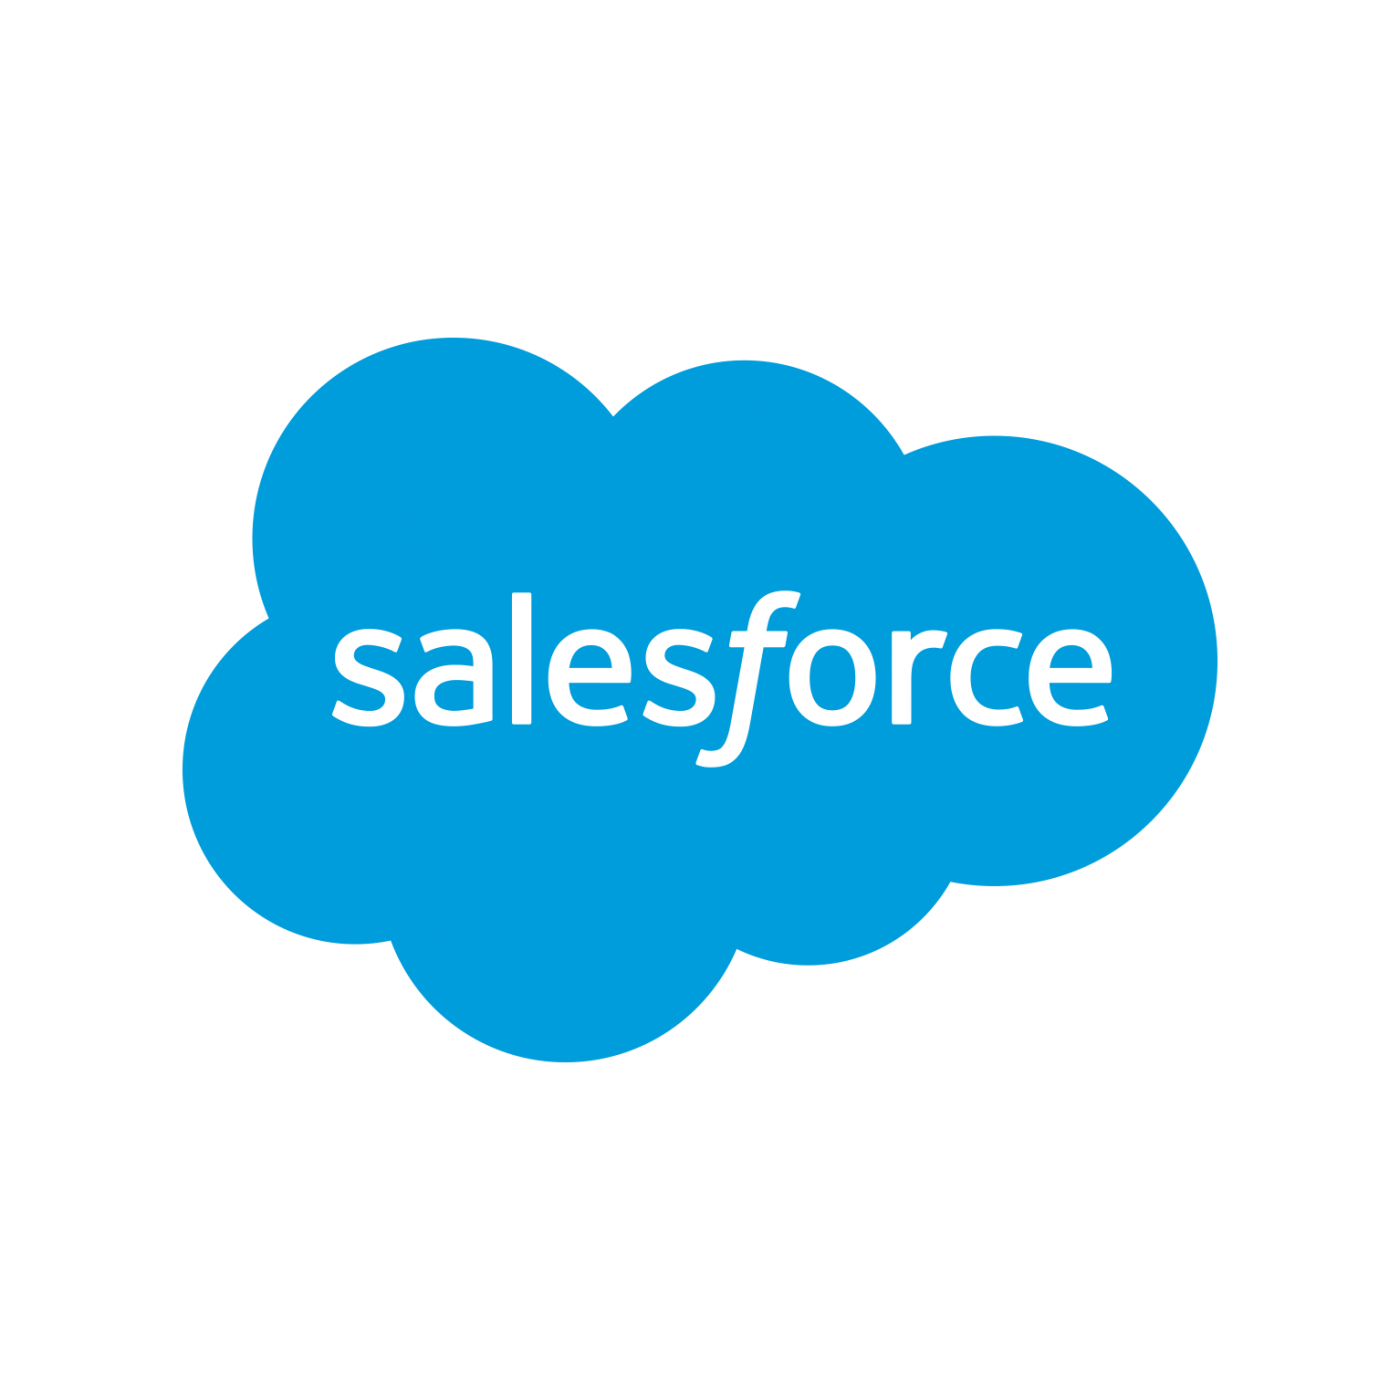 Salesforce square 1400x1400 - Salesforce